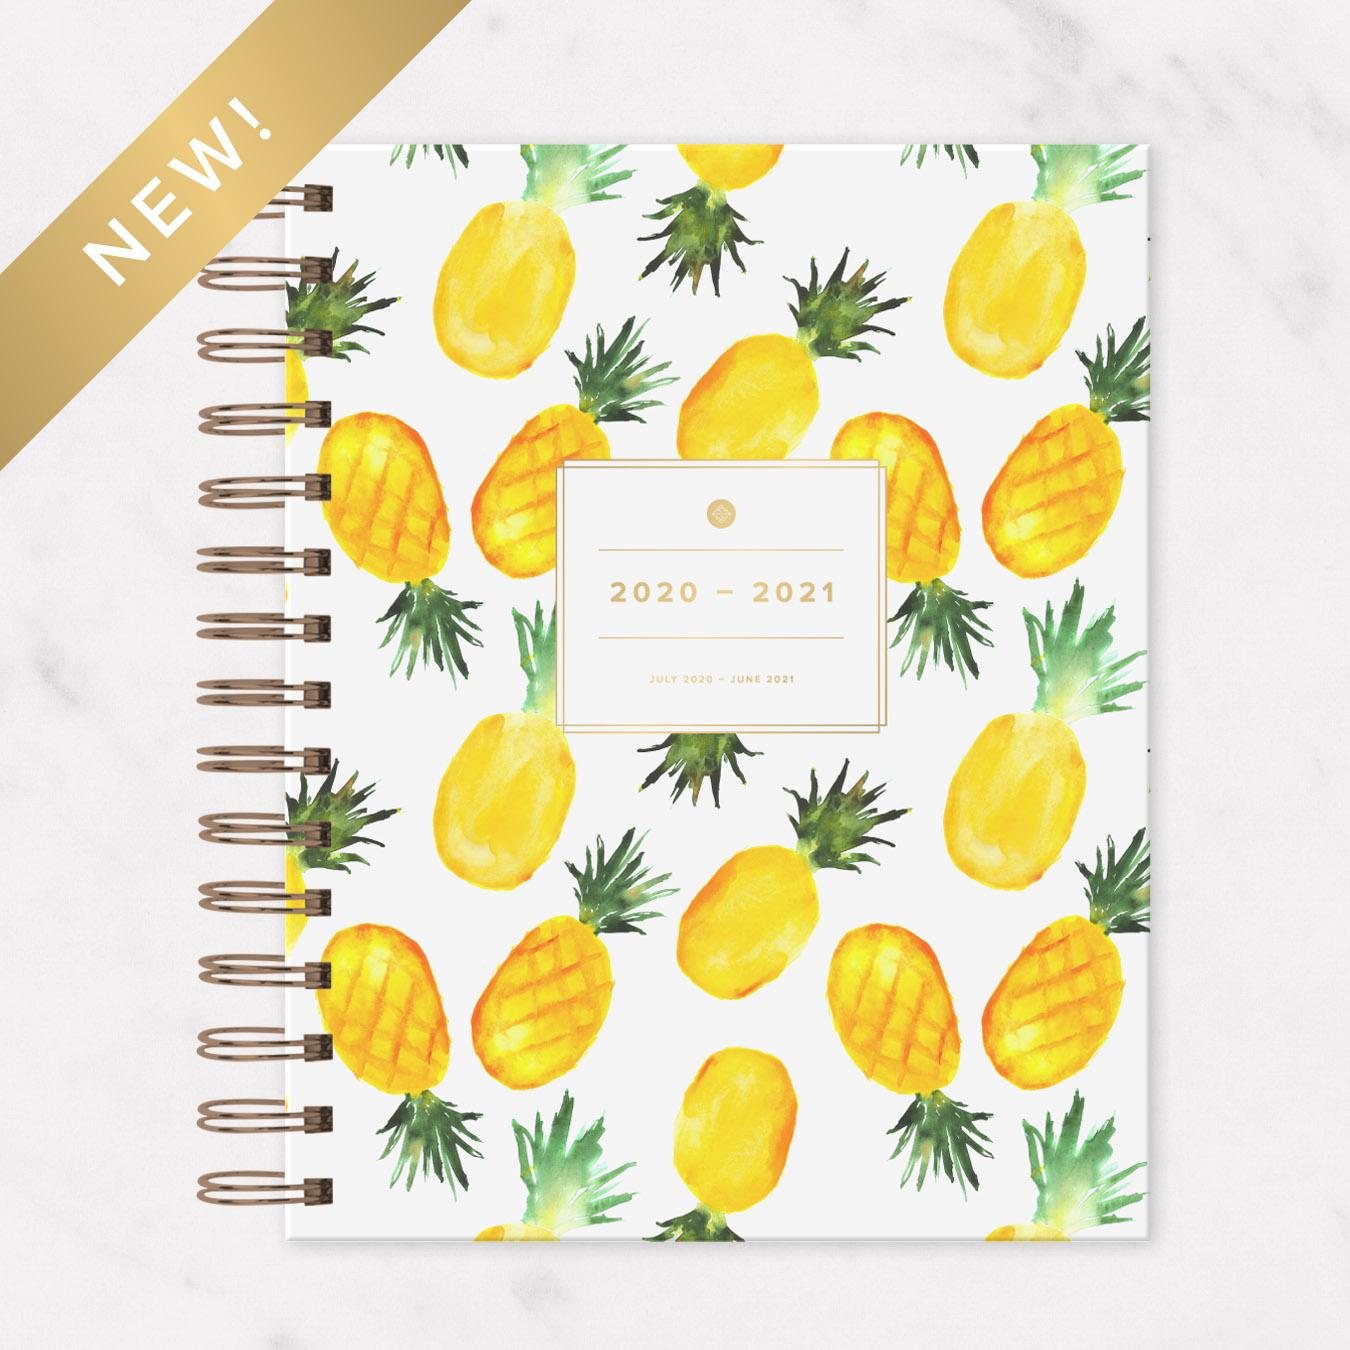 2020 - 2021 IVF Planner Pineapple